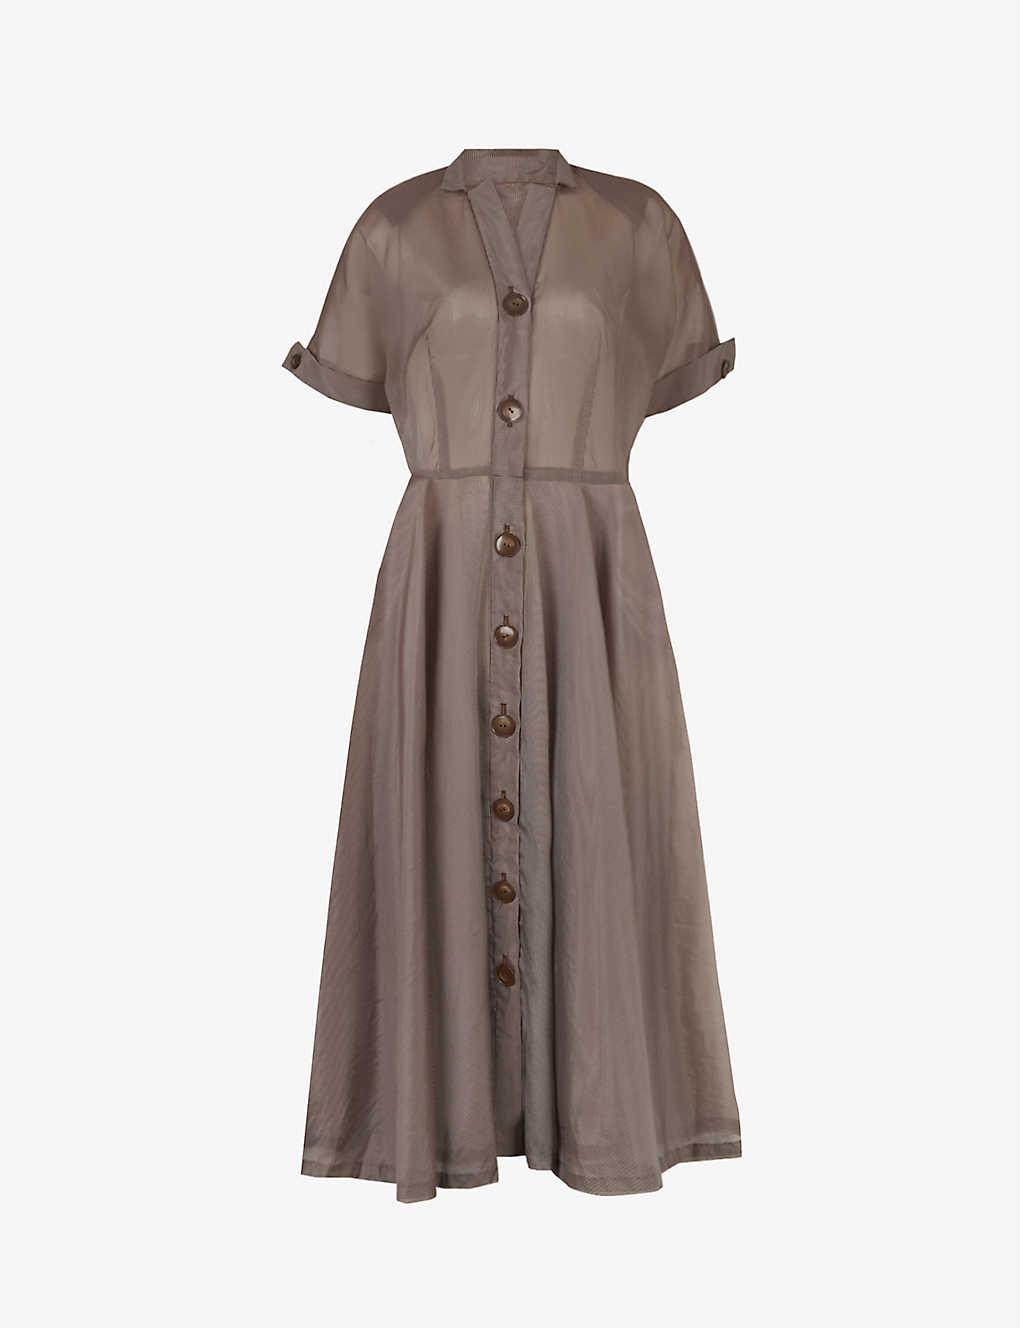 Pre-loved 1950s pin-stripe woven midi dress